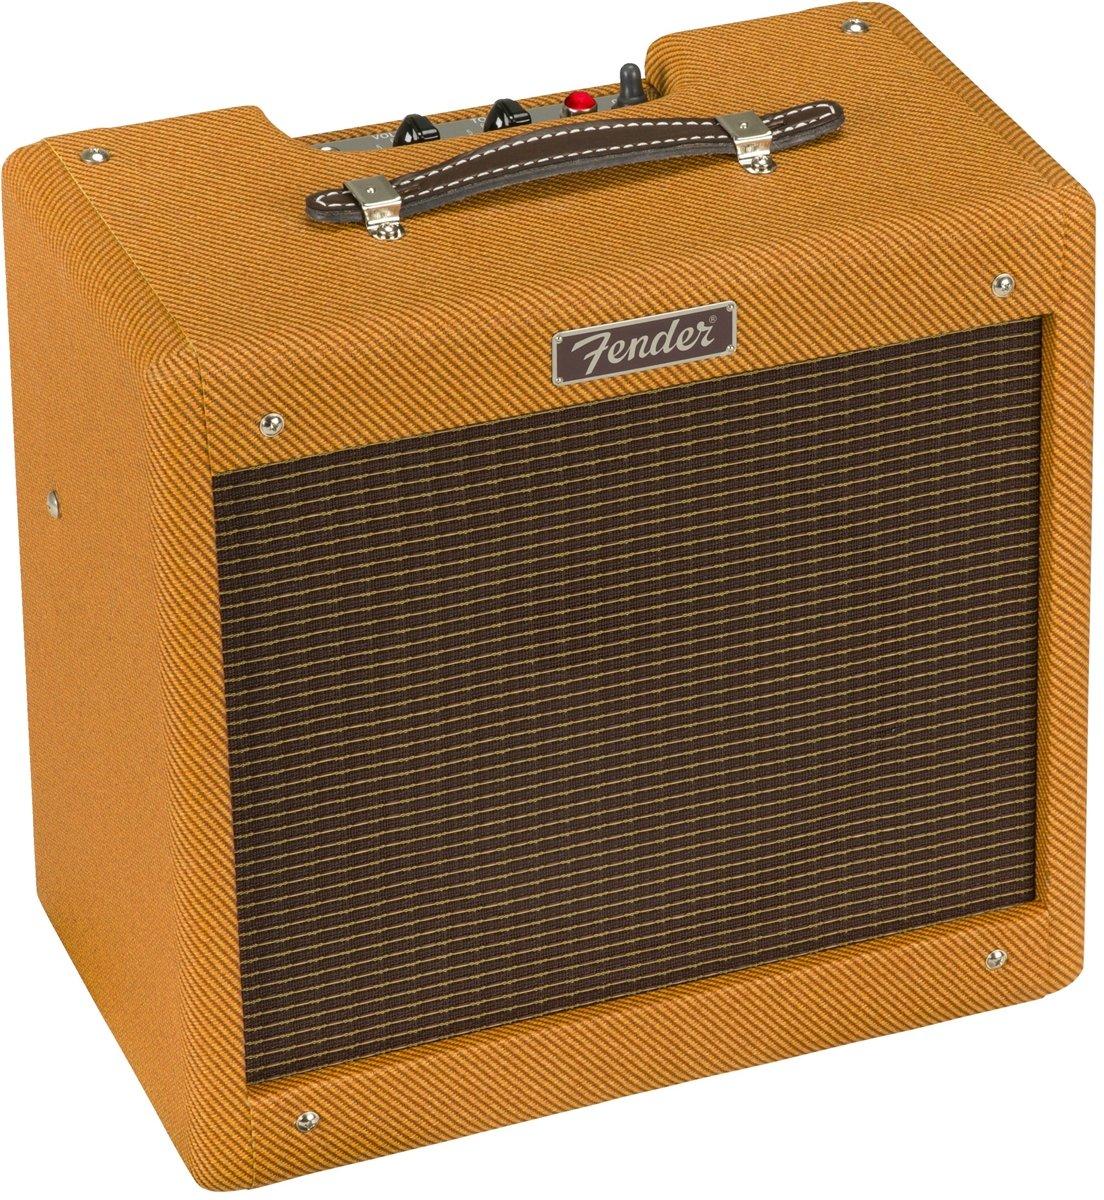 Fender Pro Junior IV 15 Watt Electric Guitar Amplifier by Fender (Image #2)